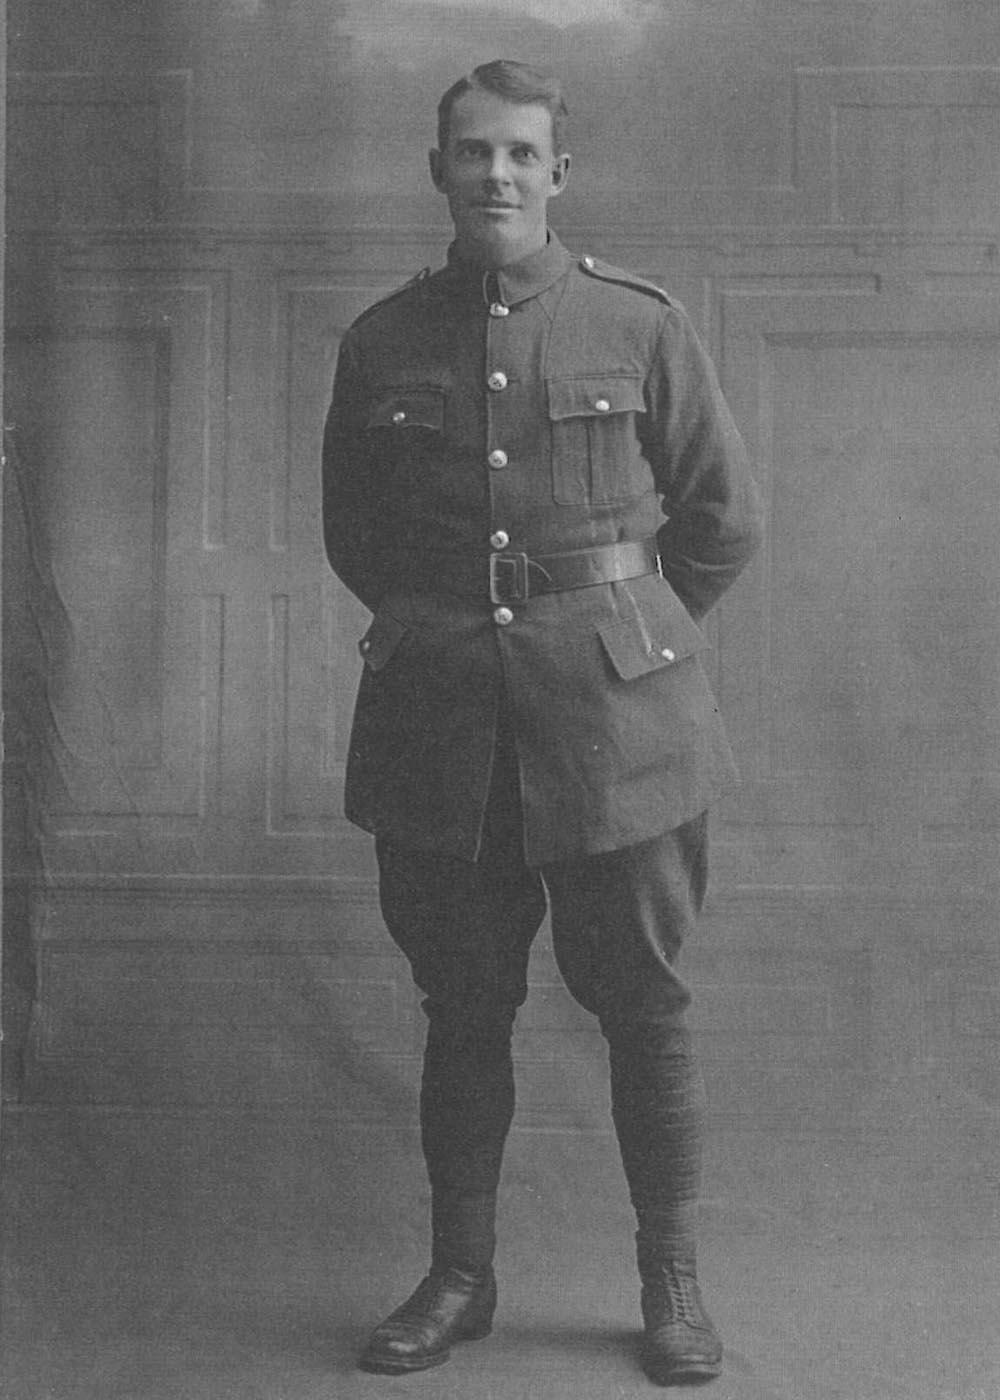 Private Hugh Christopher Lyall